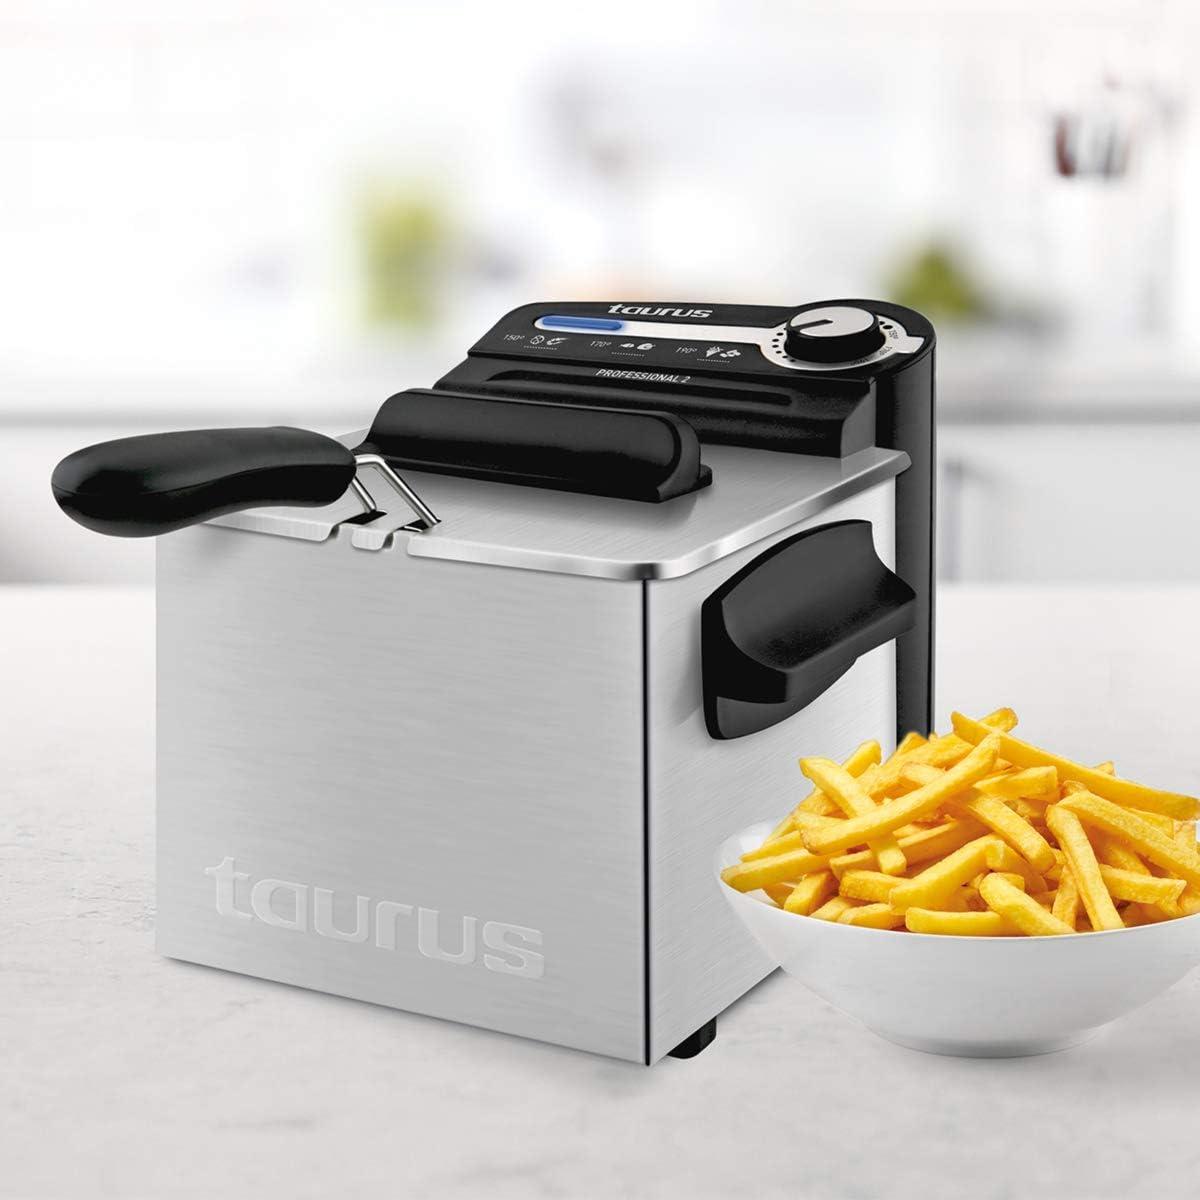 Taurus Professional 2 Plus Freidora, 2 litros, 1700 W, 18/8 ...